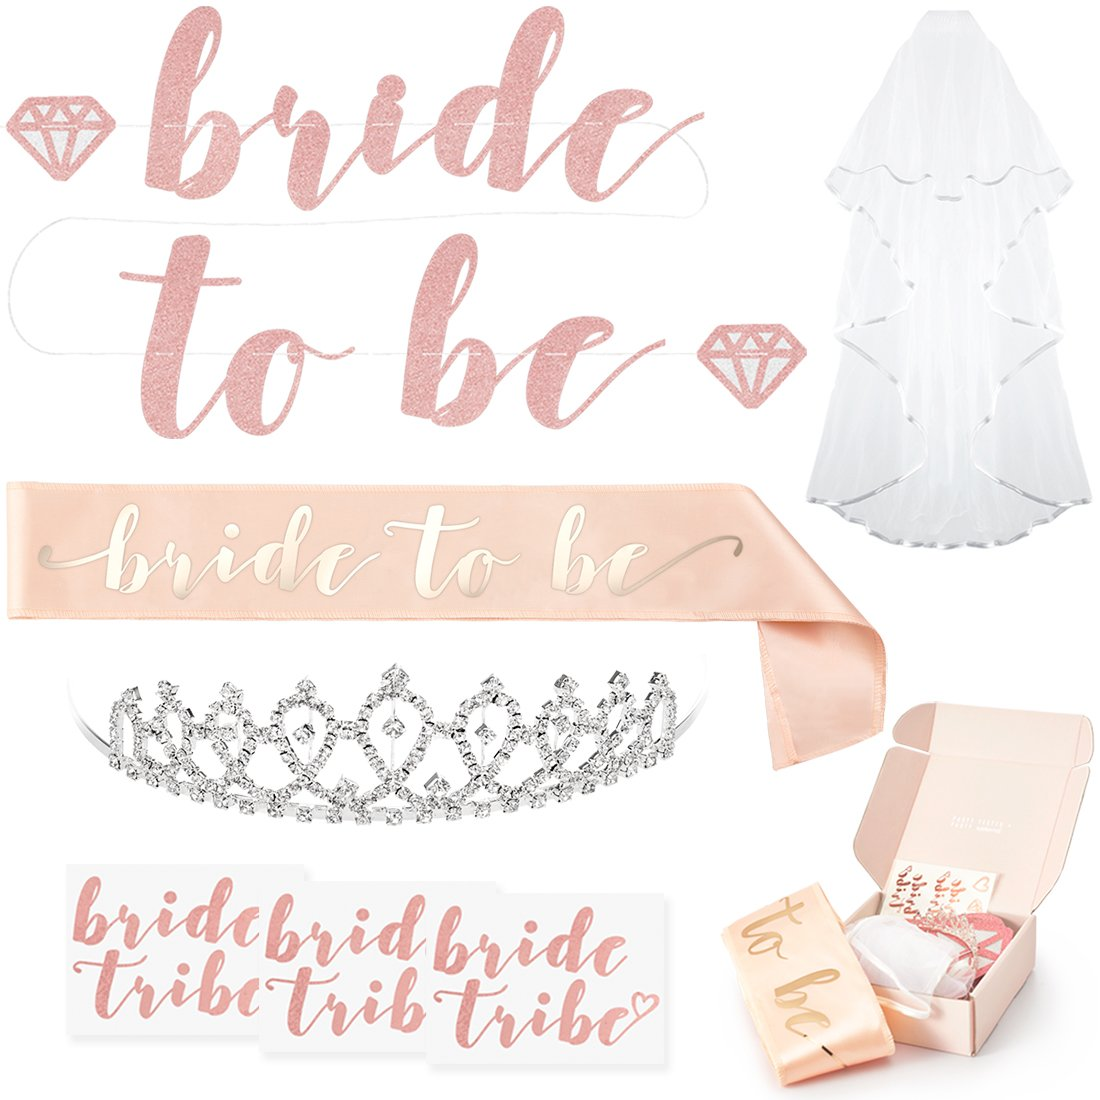 xo, Fetti Rose Gold Pink Bachelorette Party Decorations Kit - Bridal Shower Supplies | Bride to Be Sash, Rhinestone Tiara, Pre-Strung Banner, Veil + Bride Tribe Flash Tattoos